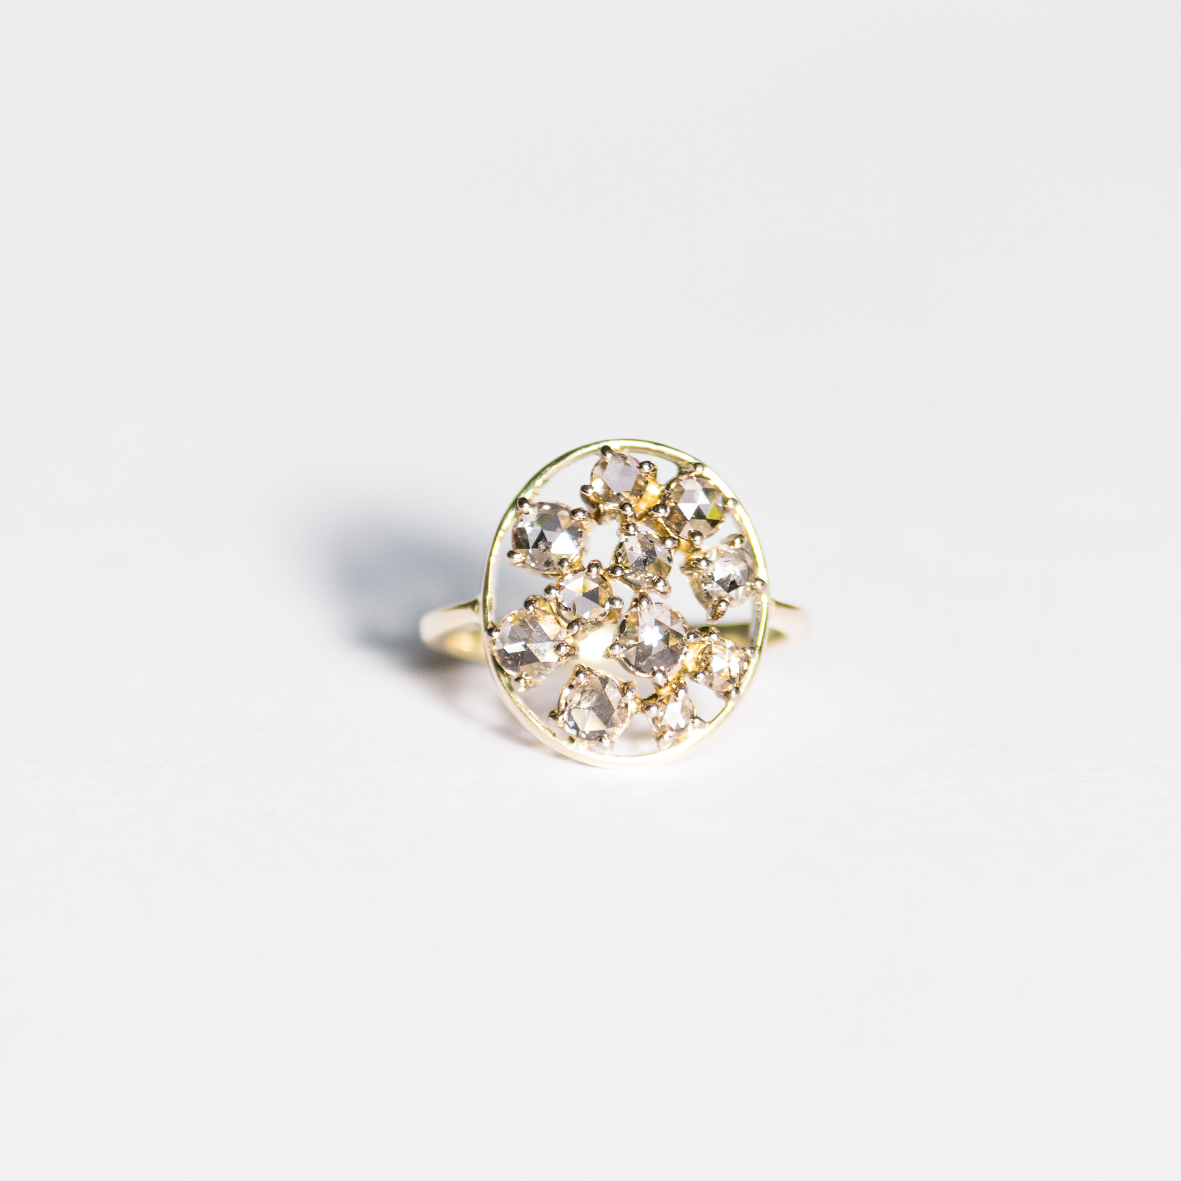 6. OONA_engagement_ficha1_diamond mosaic ring copia